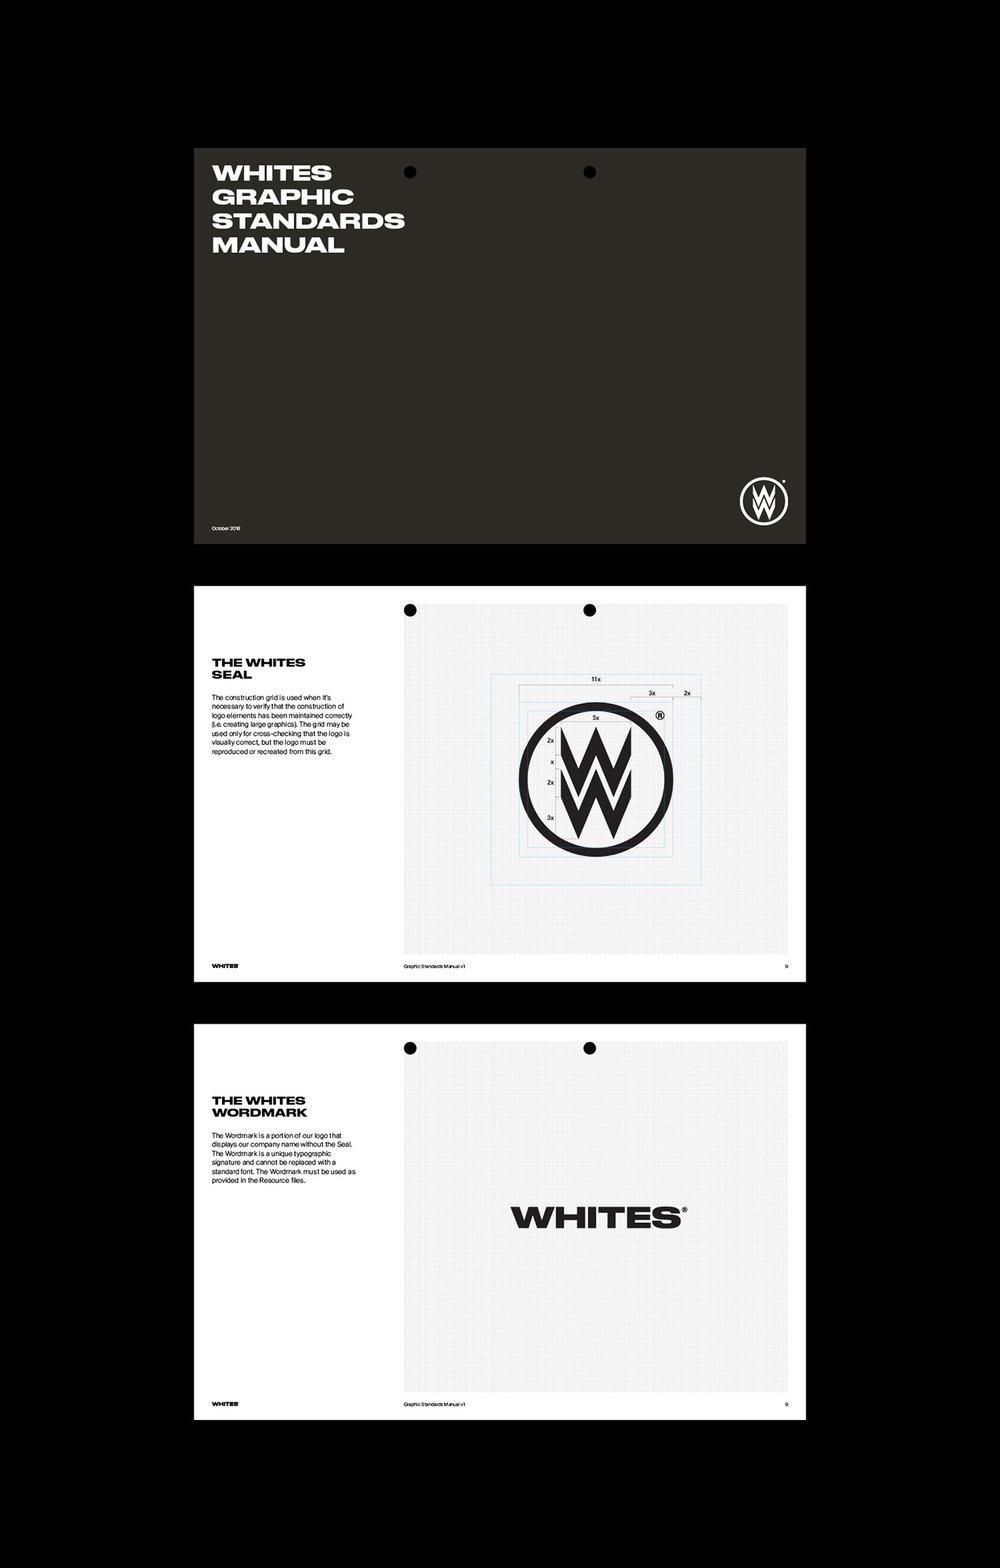 Whites-standards-manual.jpg